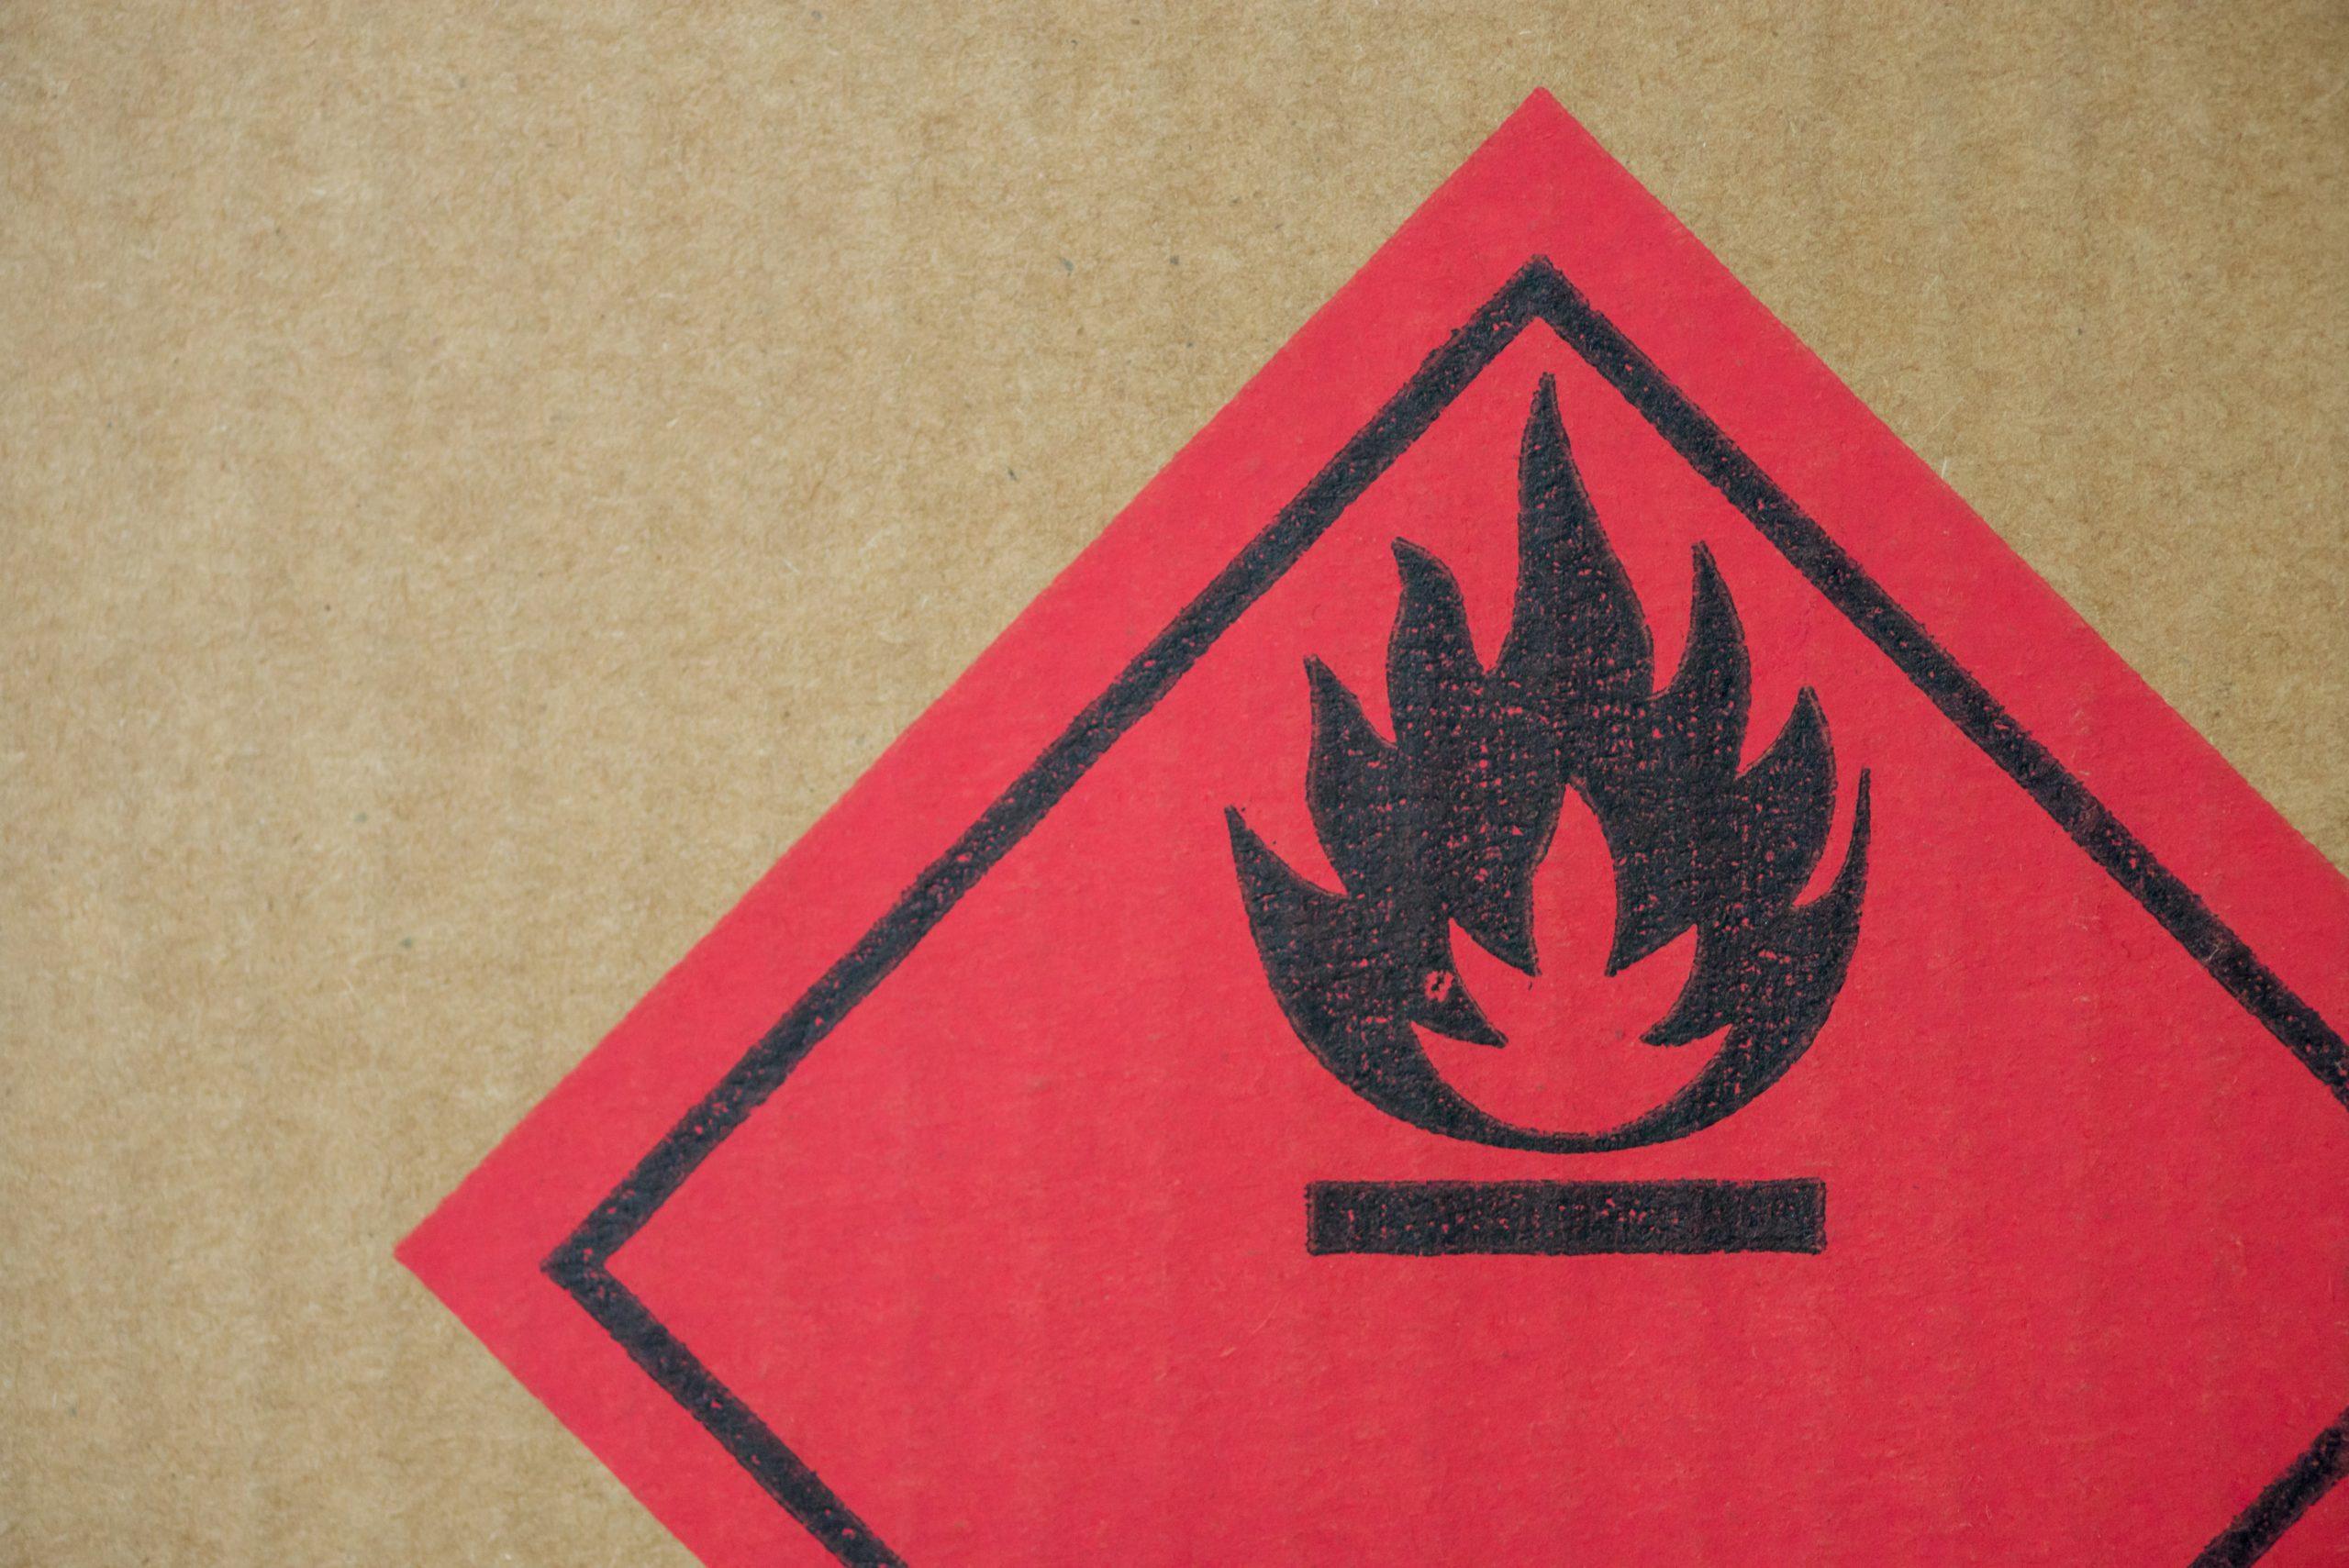 packing dangerous goods